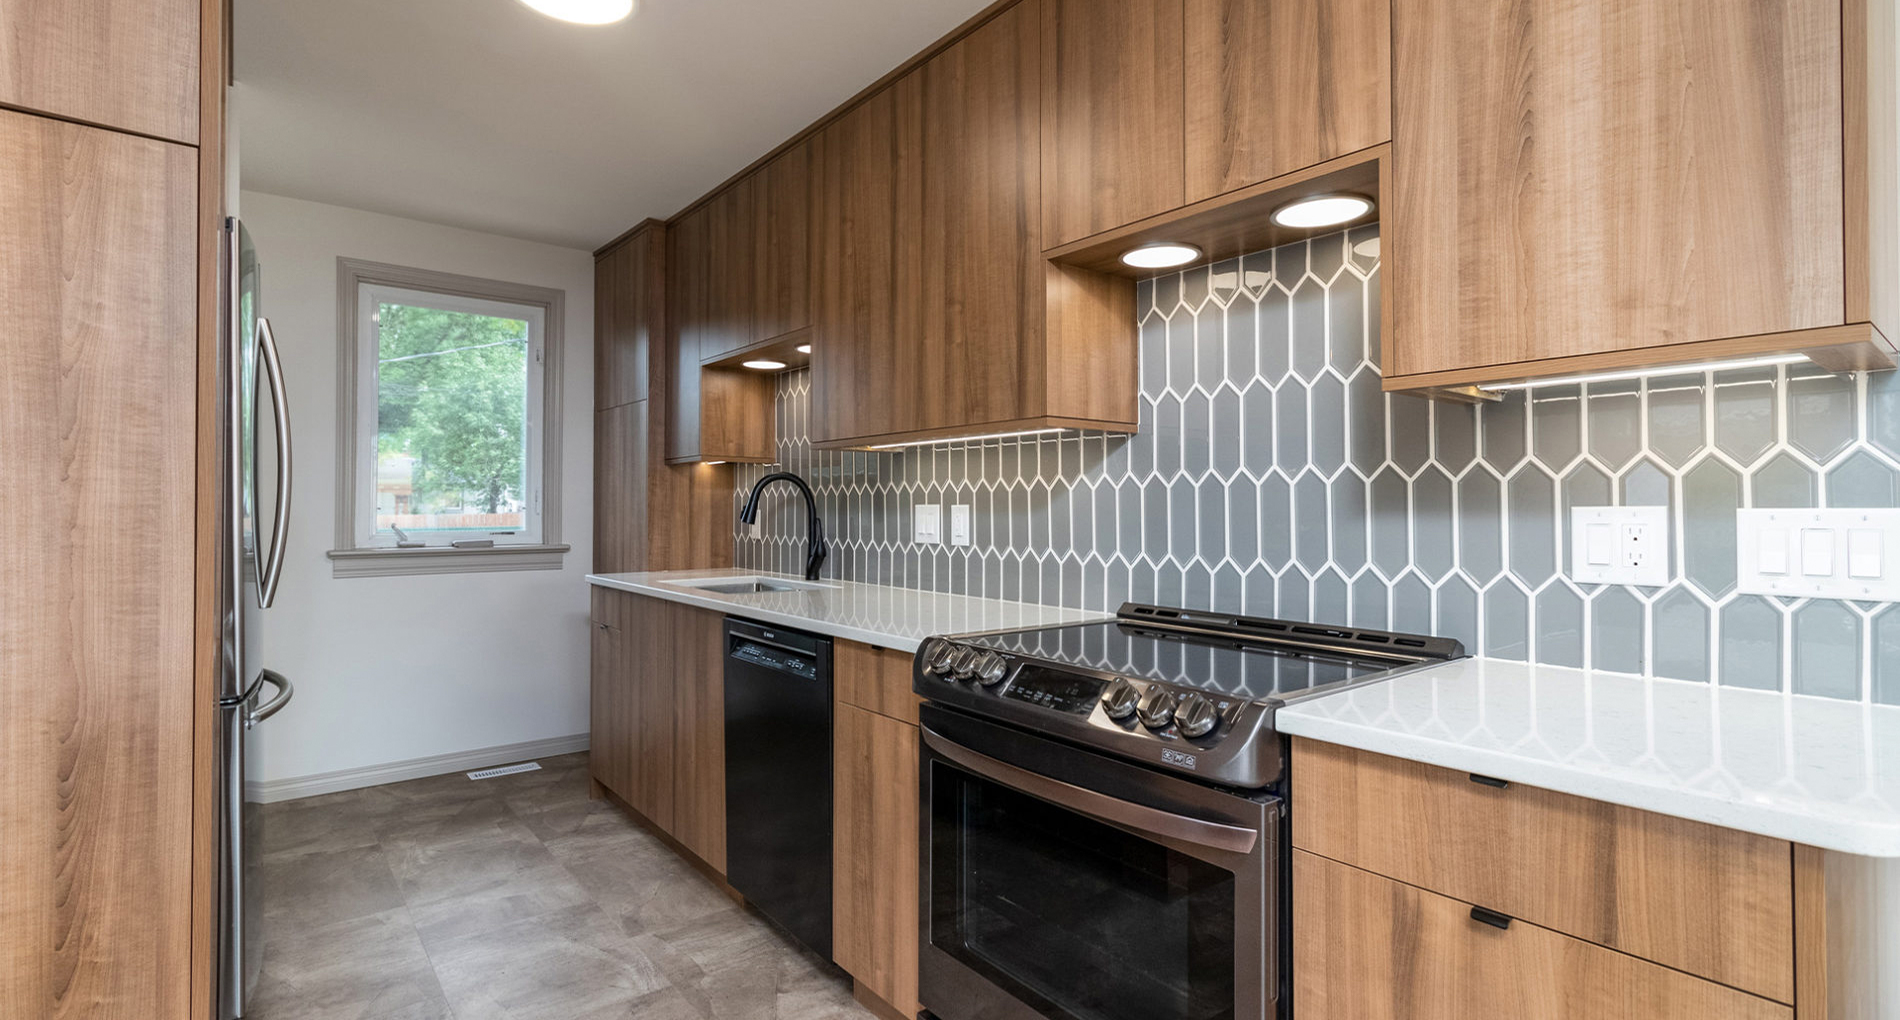 home-renovations-brandon-alair-homes-bowman-major-renovation-kitchen-1